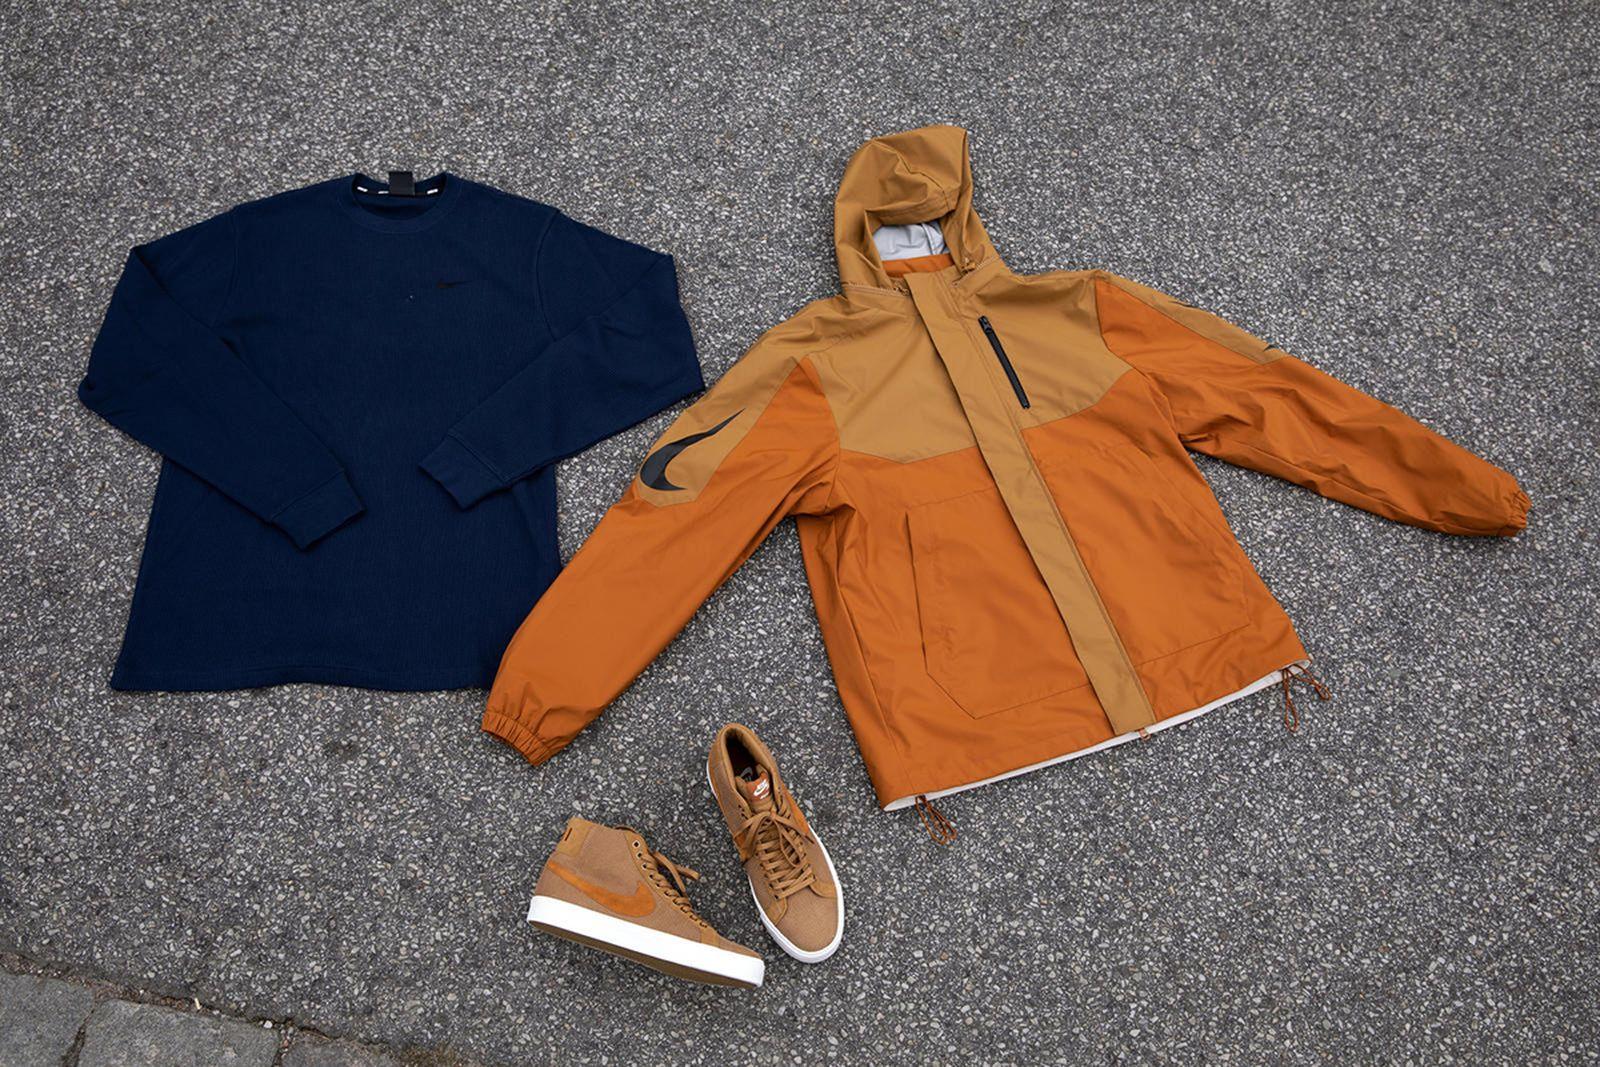 Nike SB Oski Orange Label collection